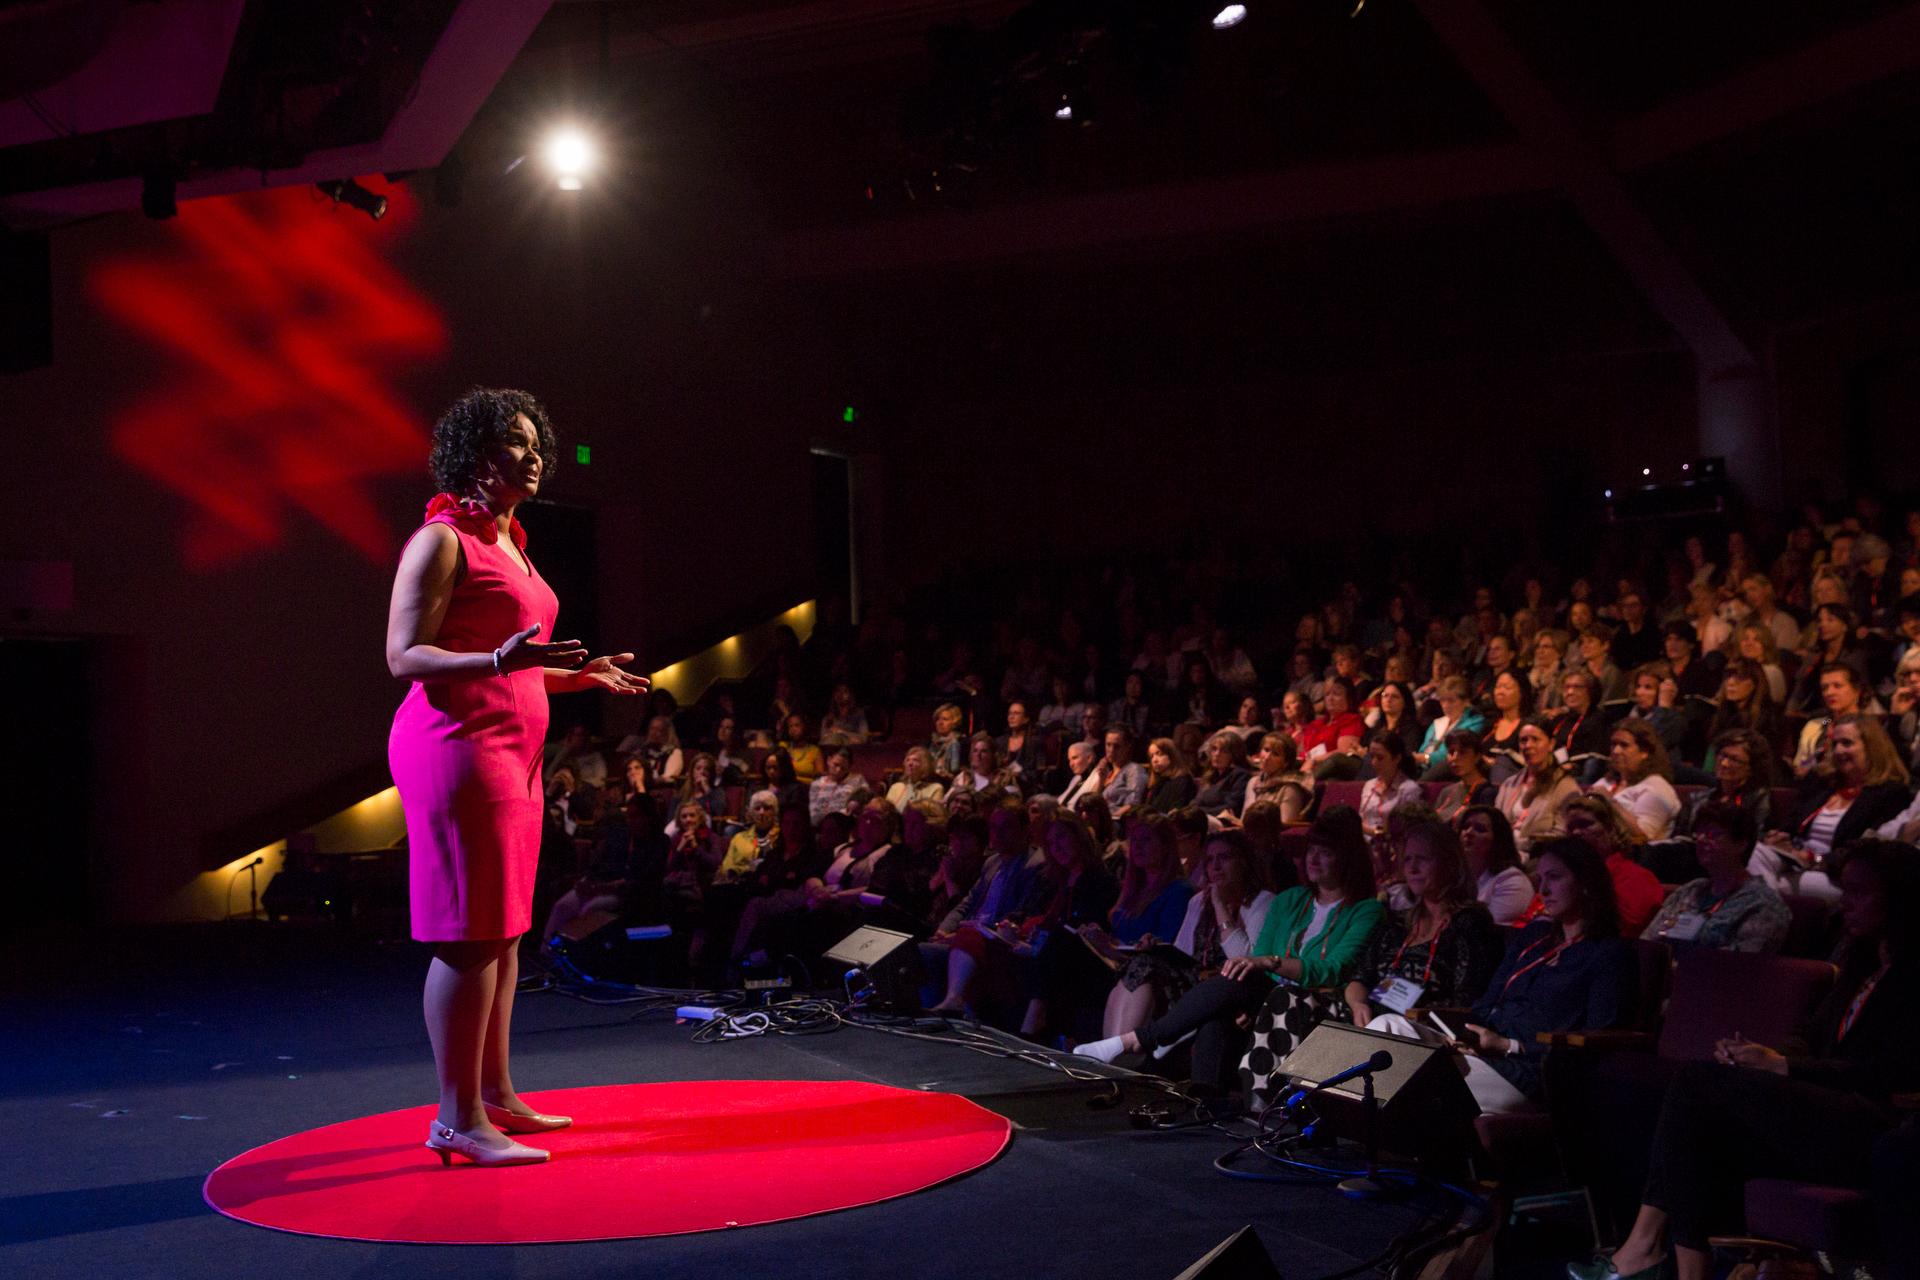 Linda Cliatt-Wayman speaks at TEDWomen2015 - Momentum, Session 5, May 28, 2015, Monterey Conference Center, Monterey, California, USA. Photo: Marla Aufmuth/TED